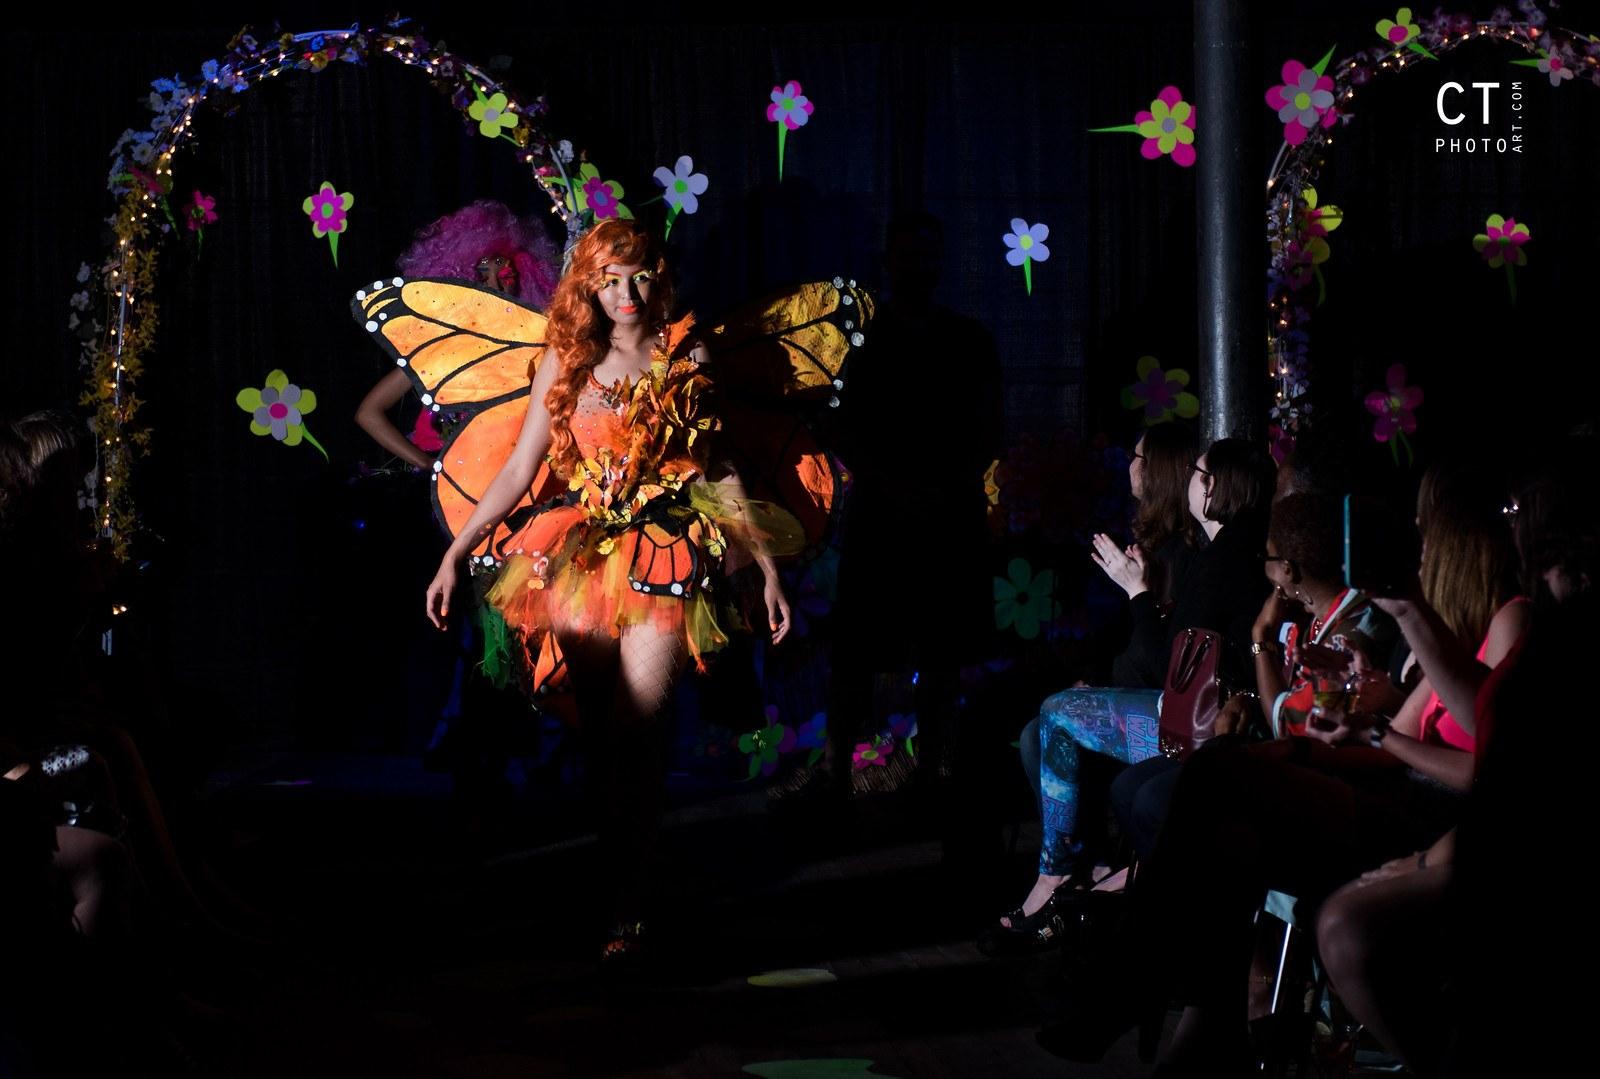 Luminescence Fashion Show at historic DTSP venue NOVA 535